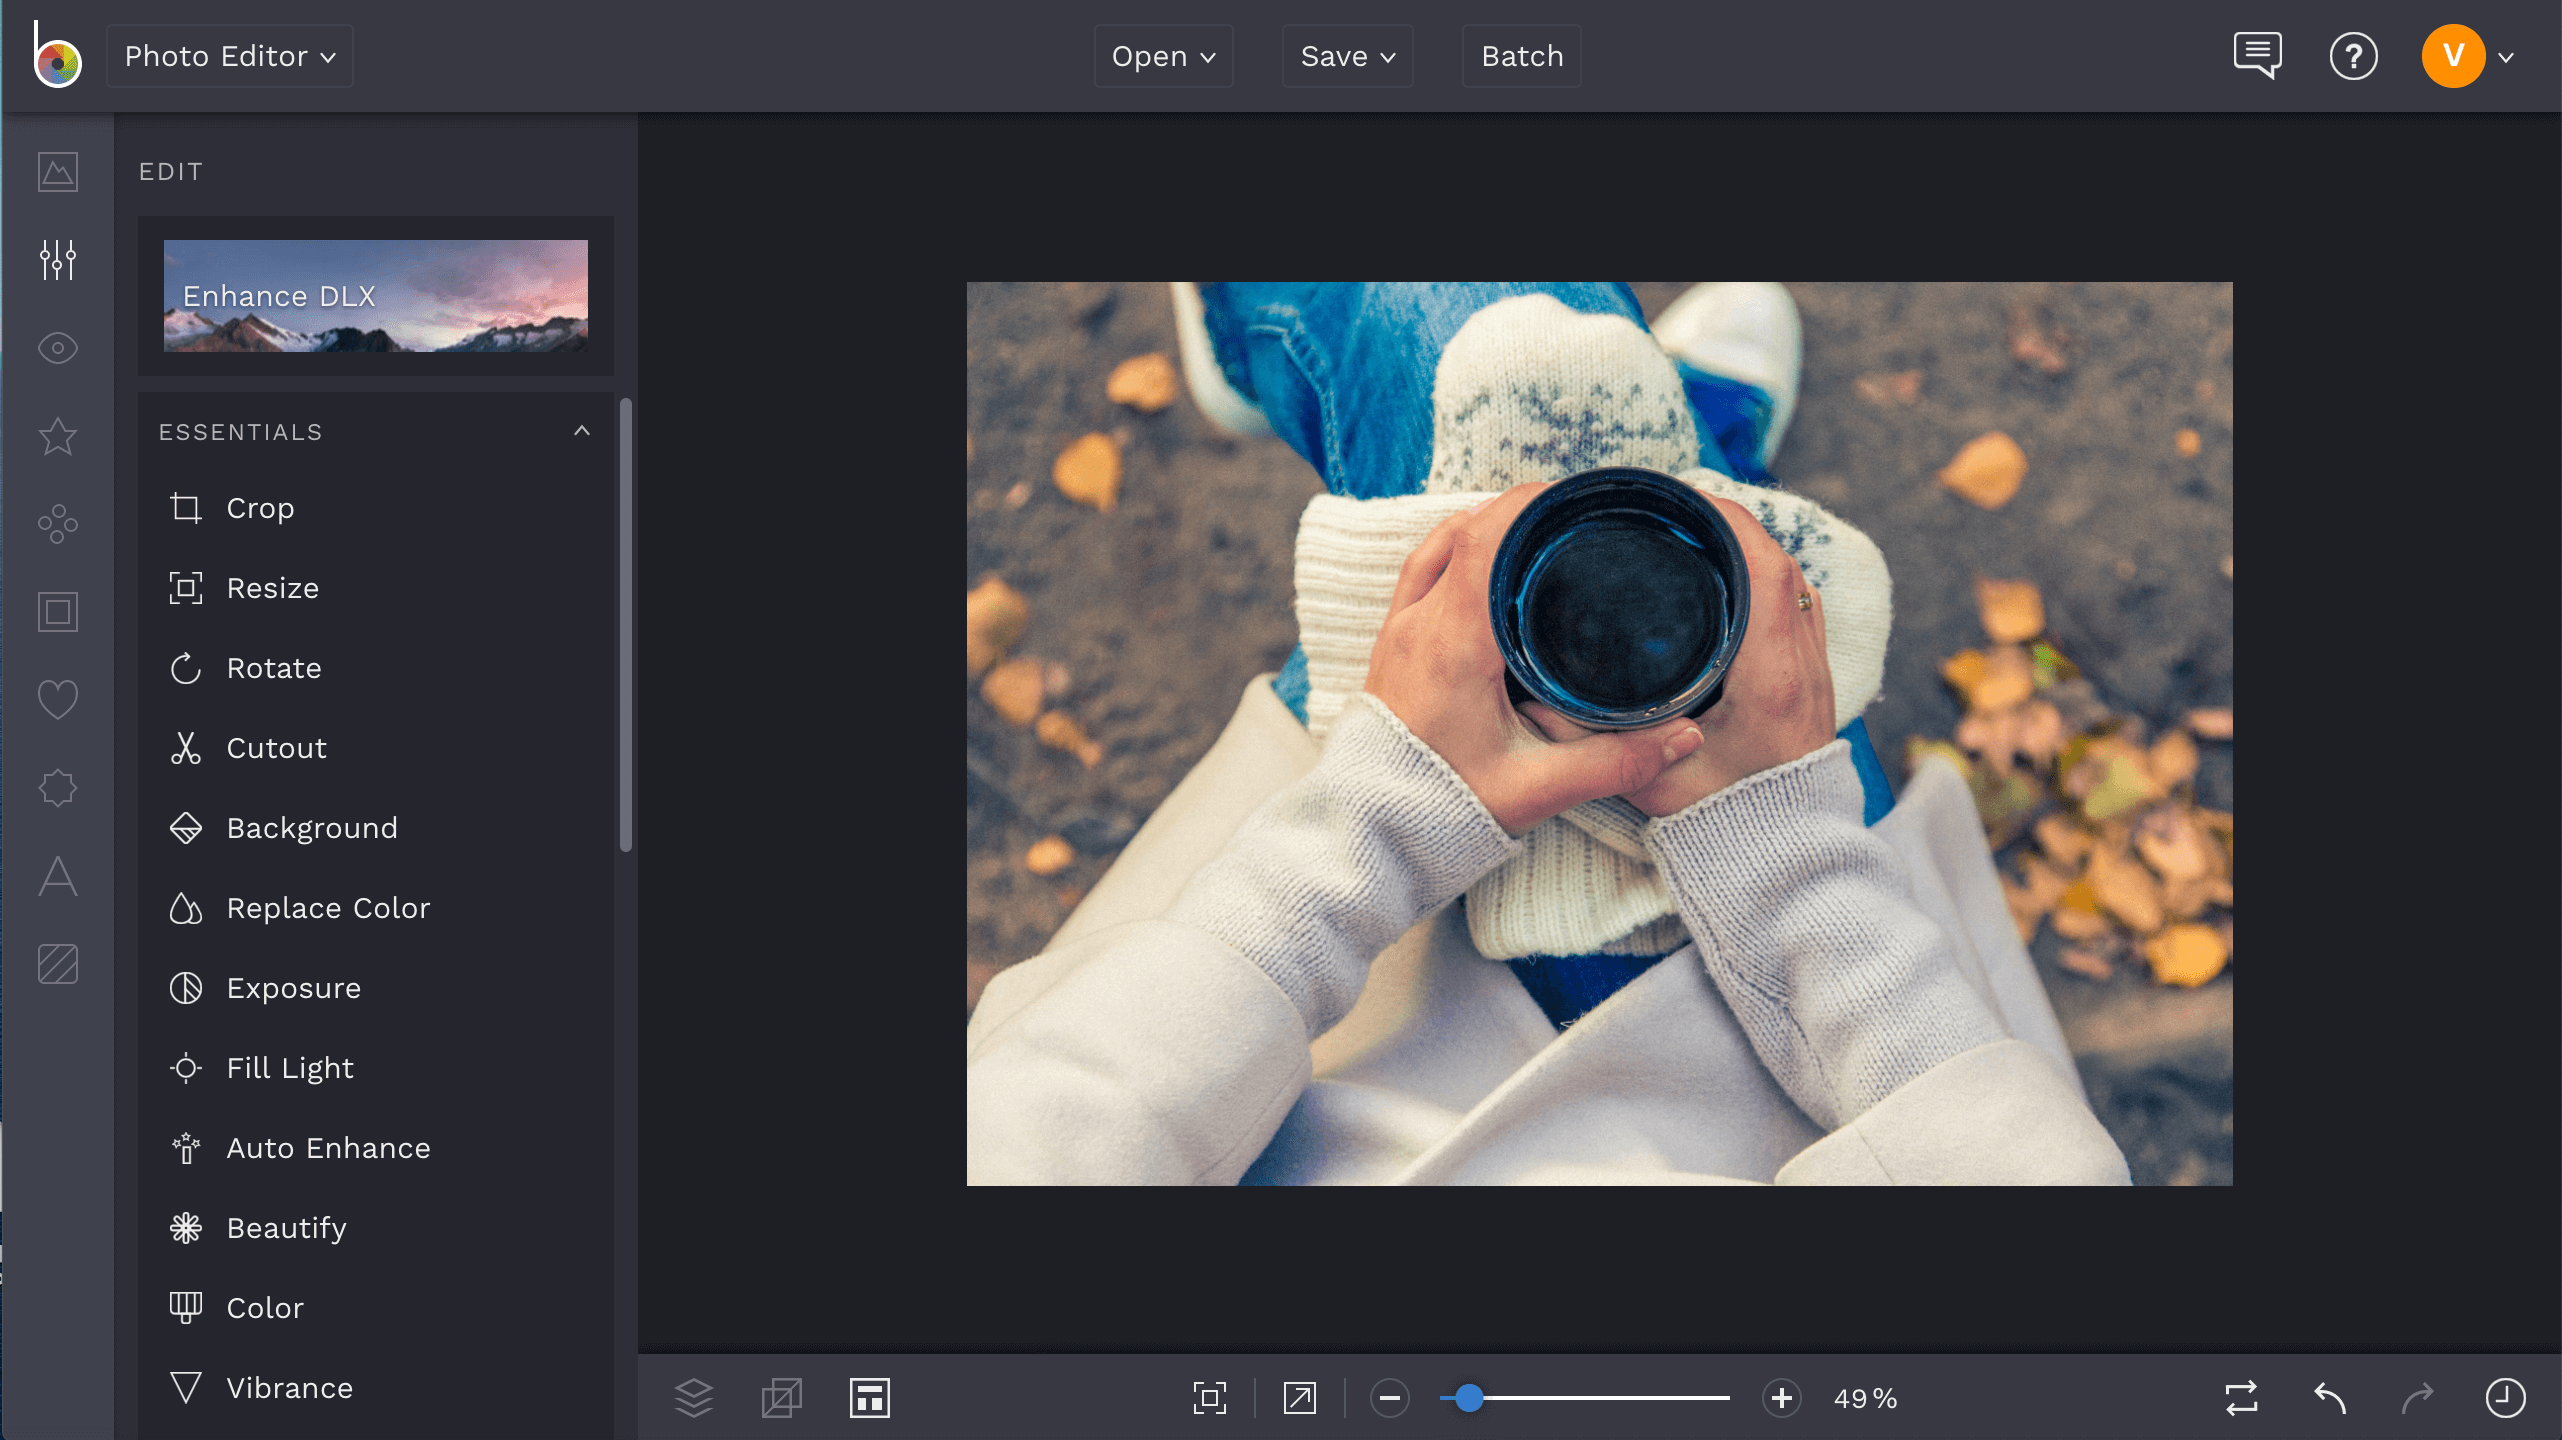 Edit photos for fall